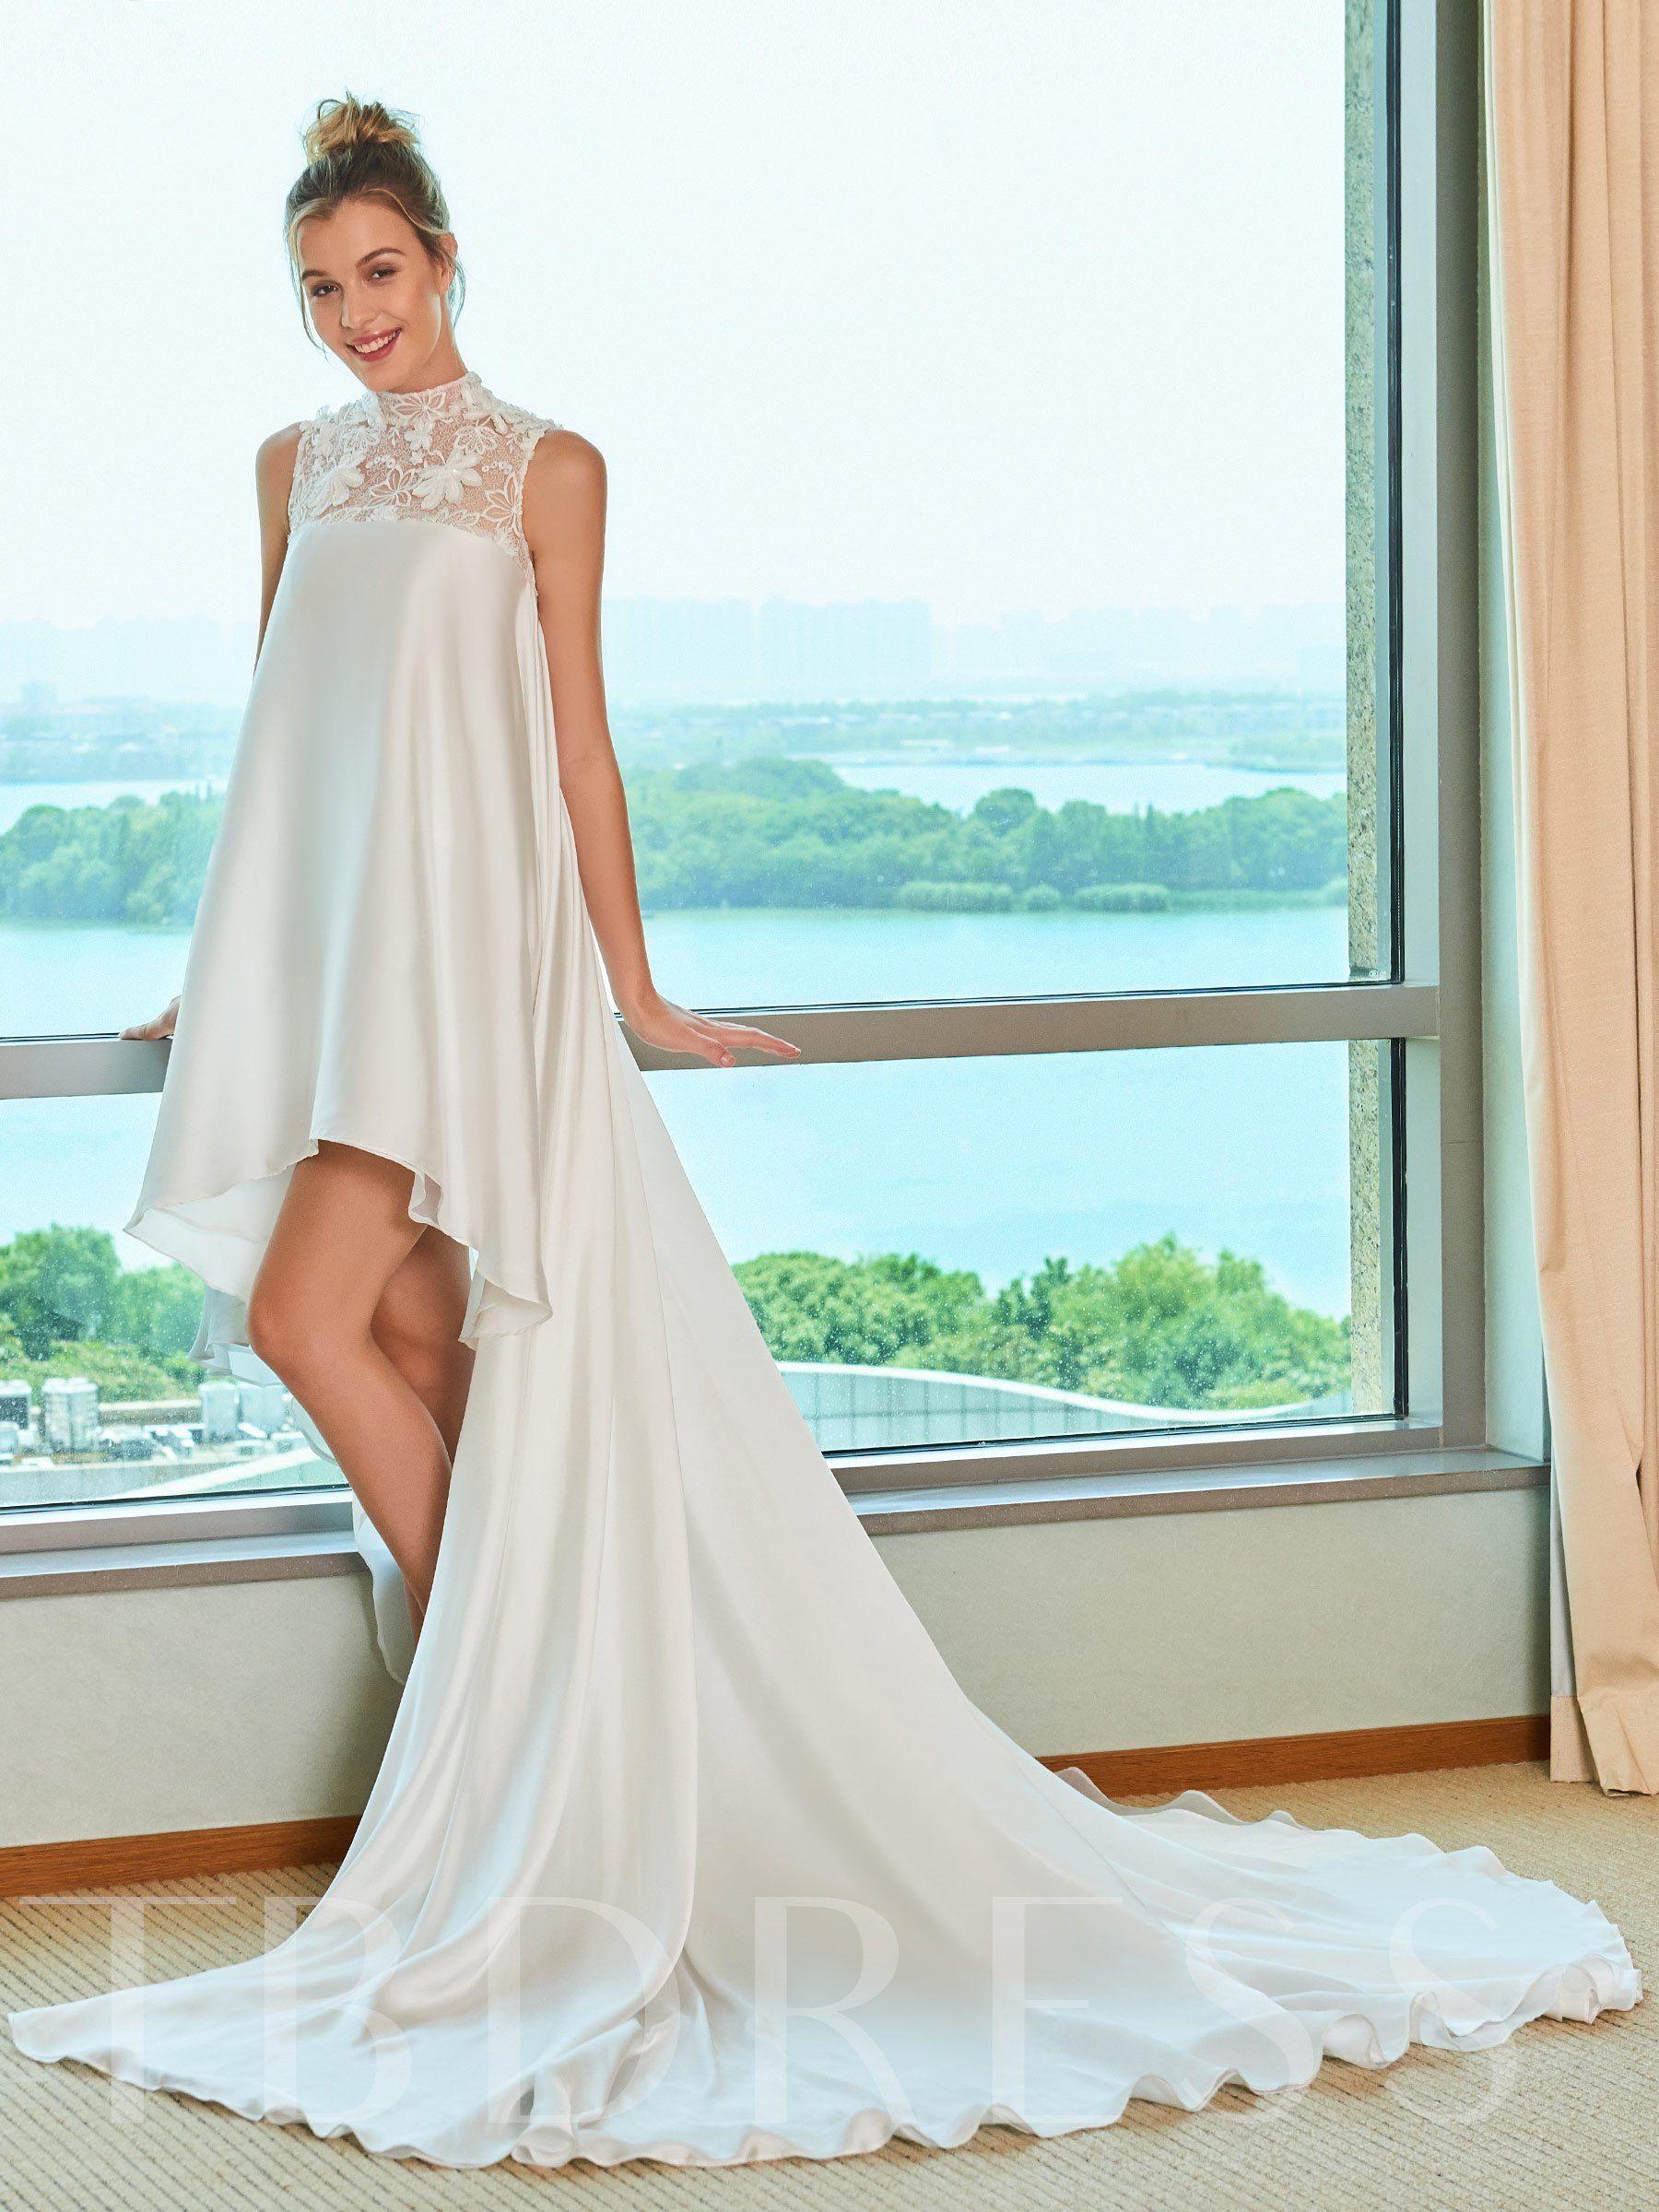 High Neck Lace Asymmetry Beach Wedding Dress Wedding Dresses